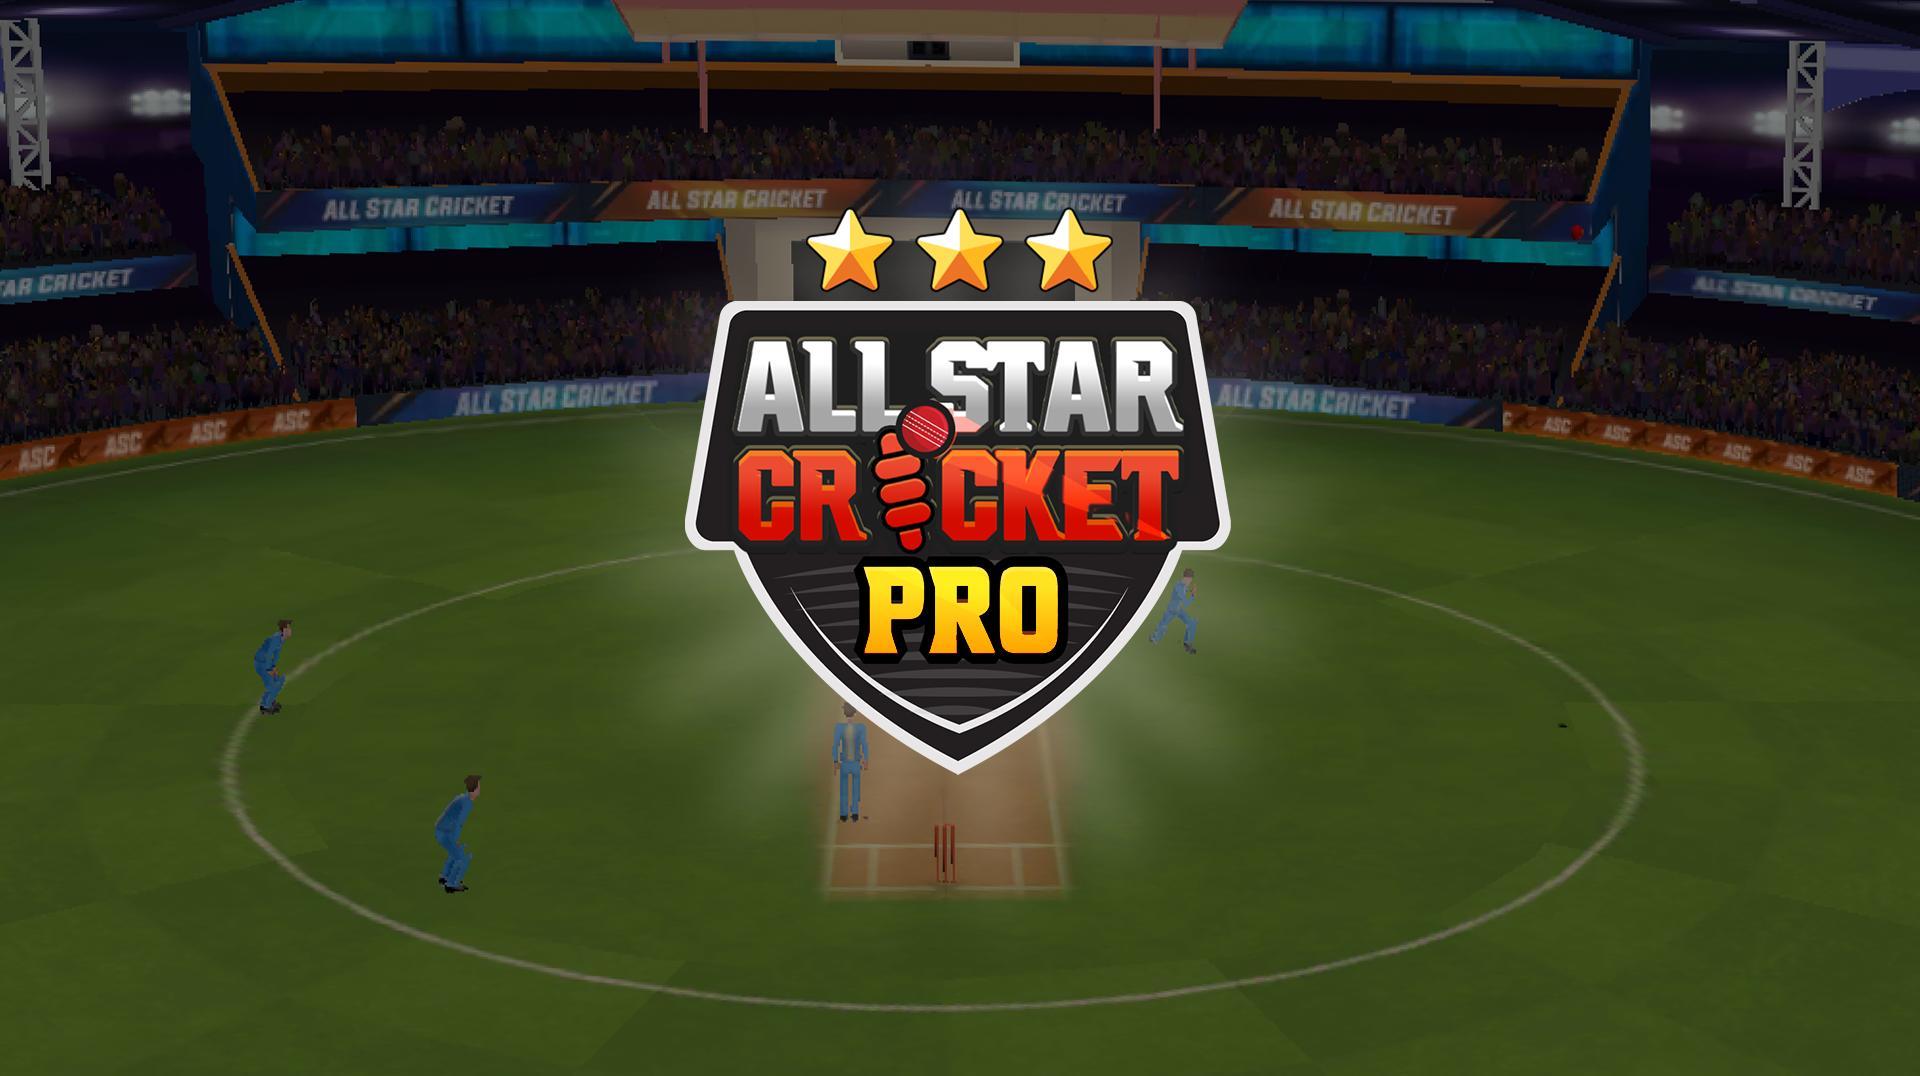 All Star Cricket Pro screenshot